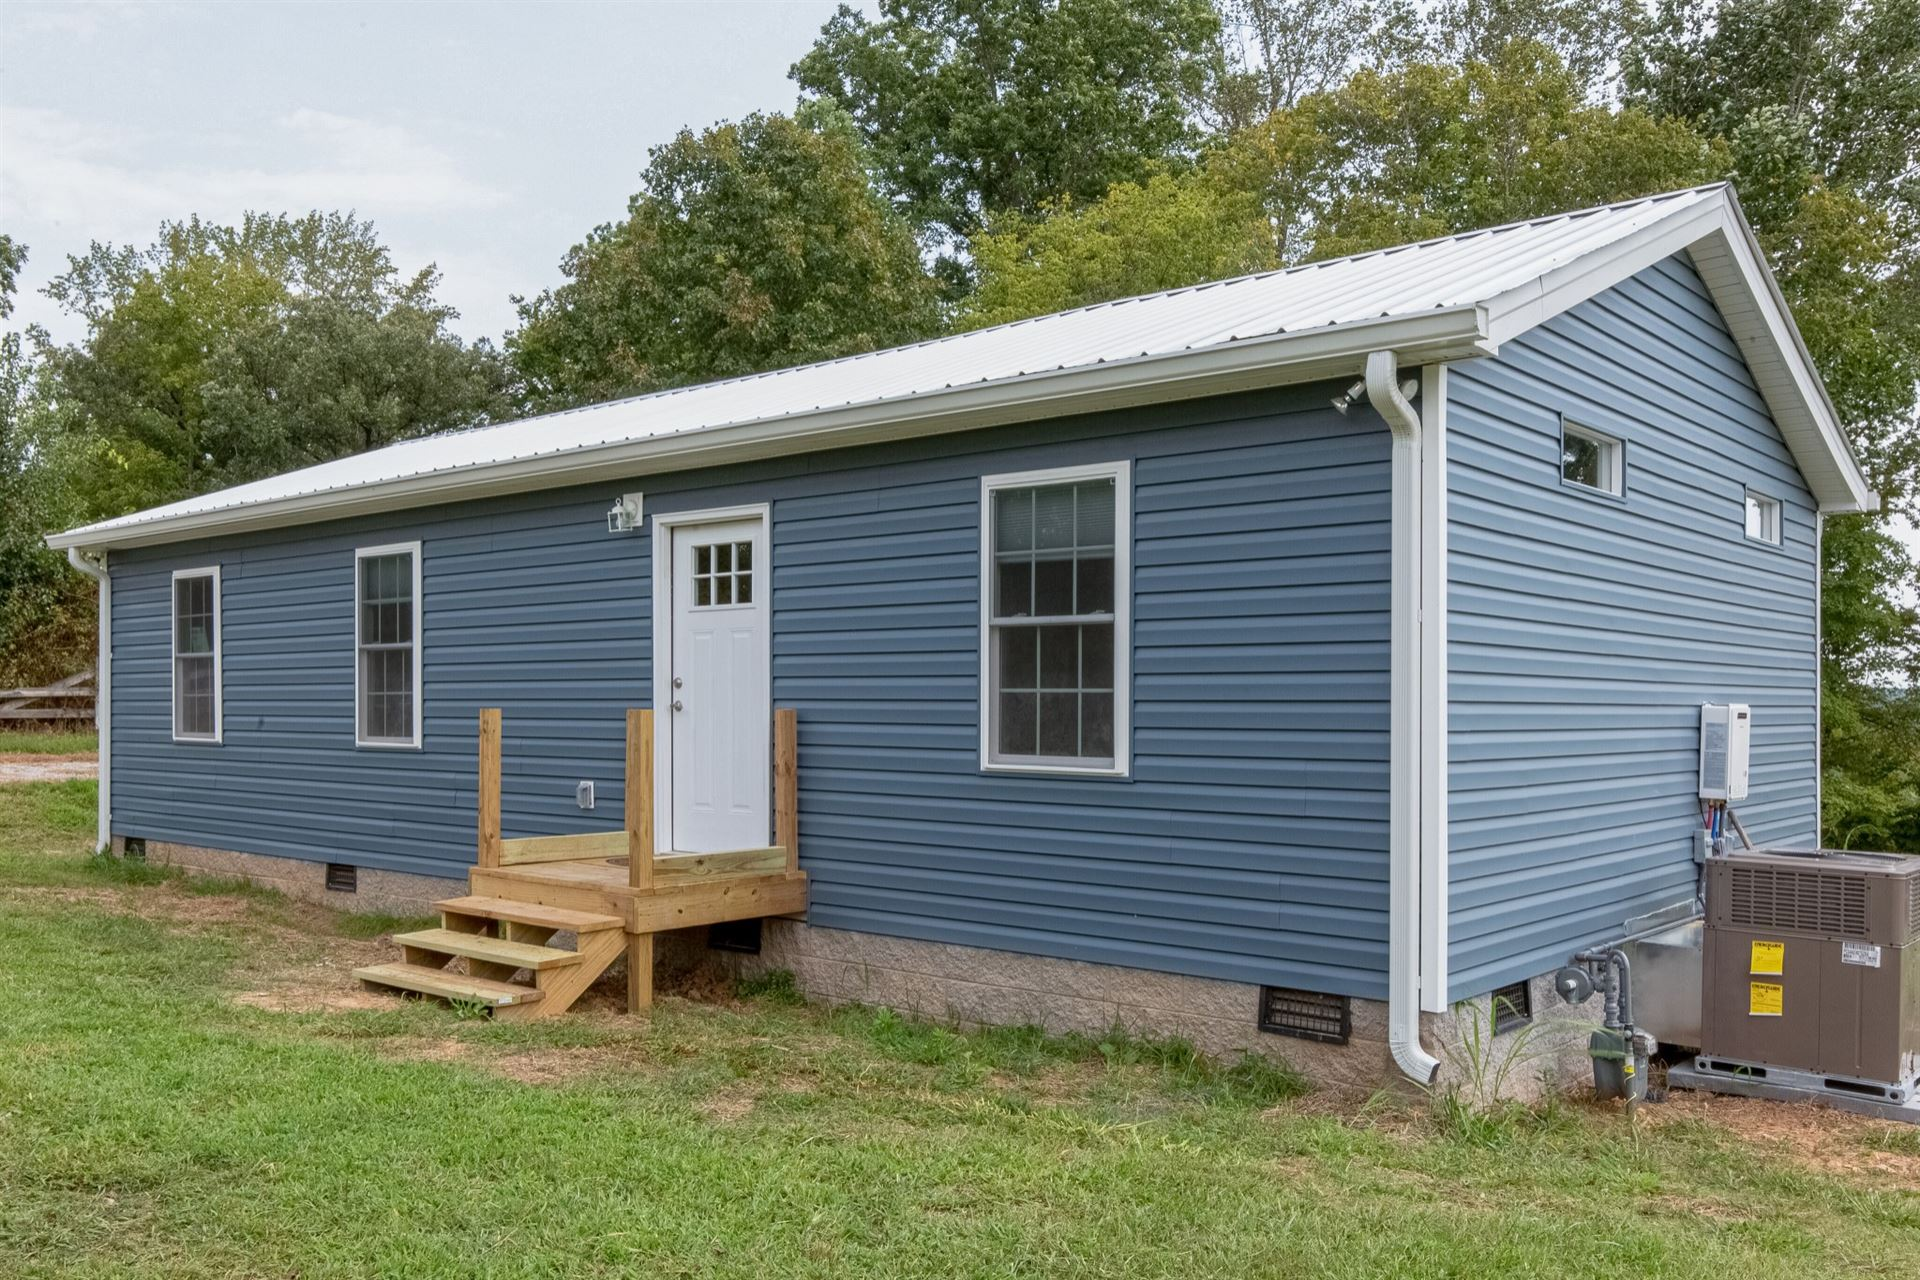 7959 Wrigley Rd, Lyles, TN 37098 - MLS#: 2292324